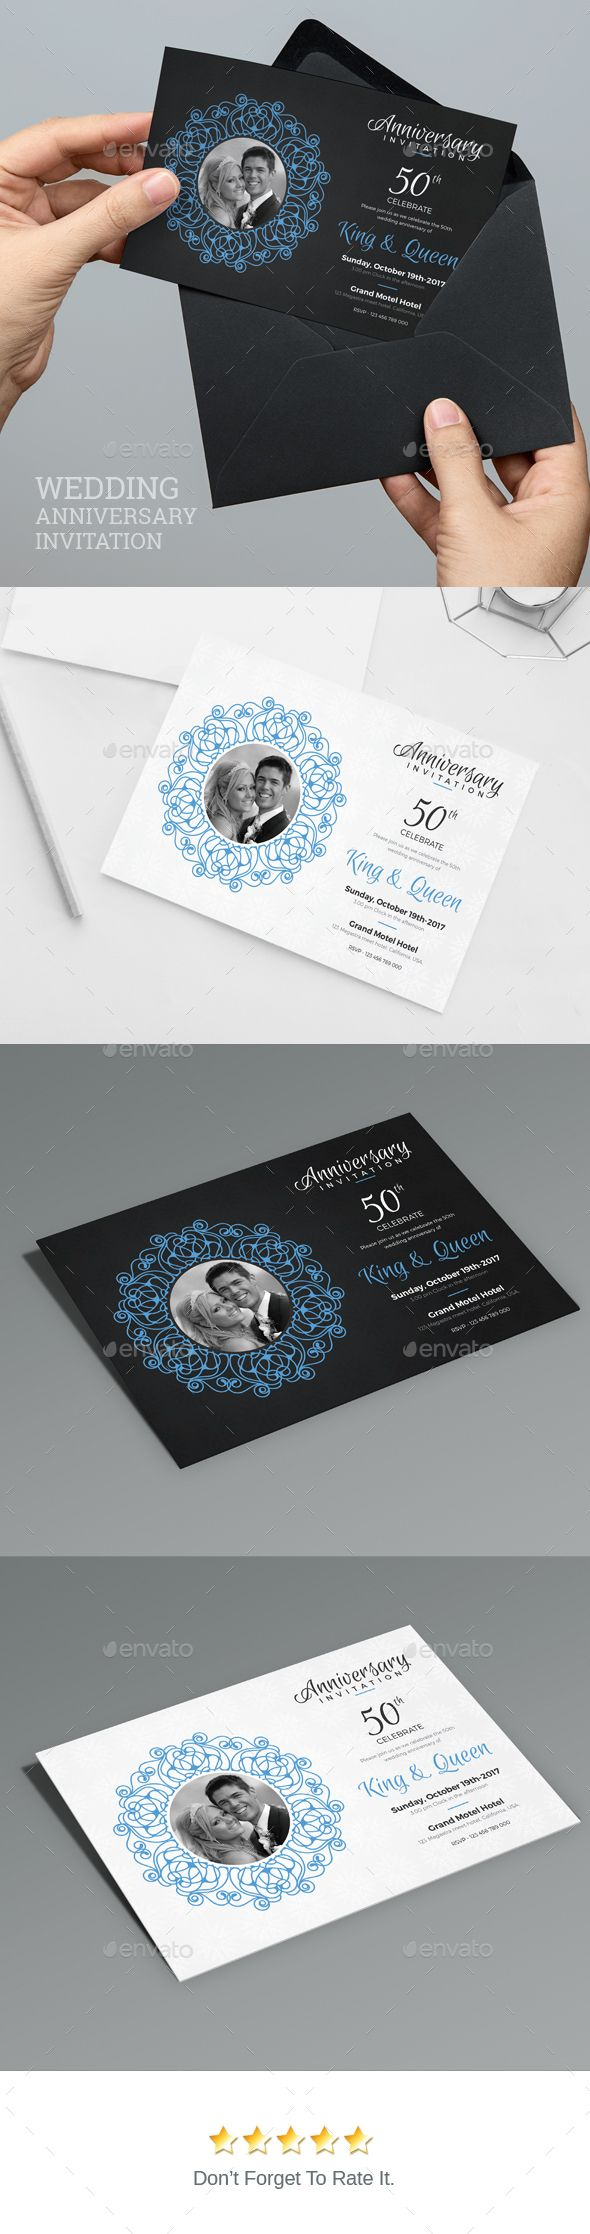 Anniversary Invitation by artBeta Modern WeddingMarriage Invitation